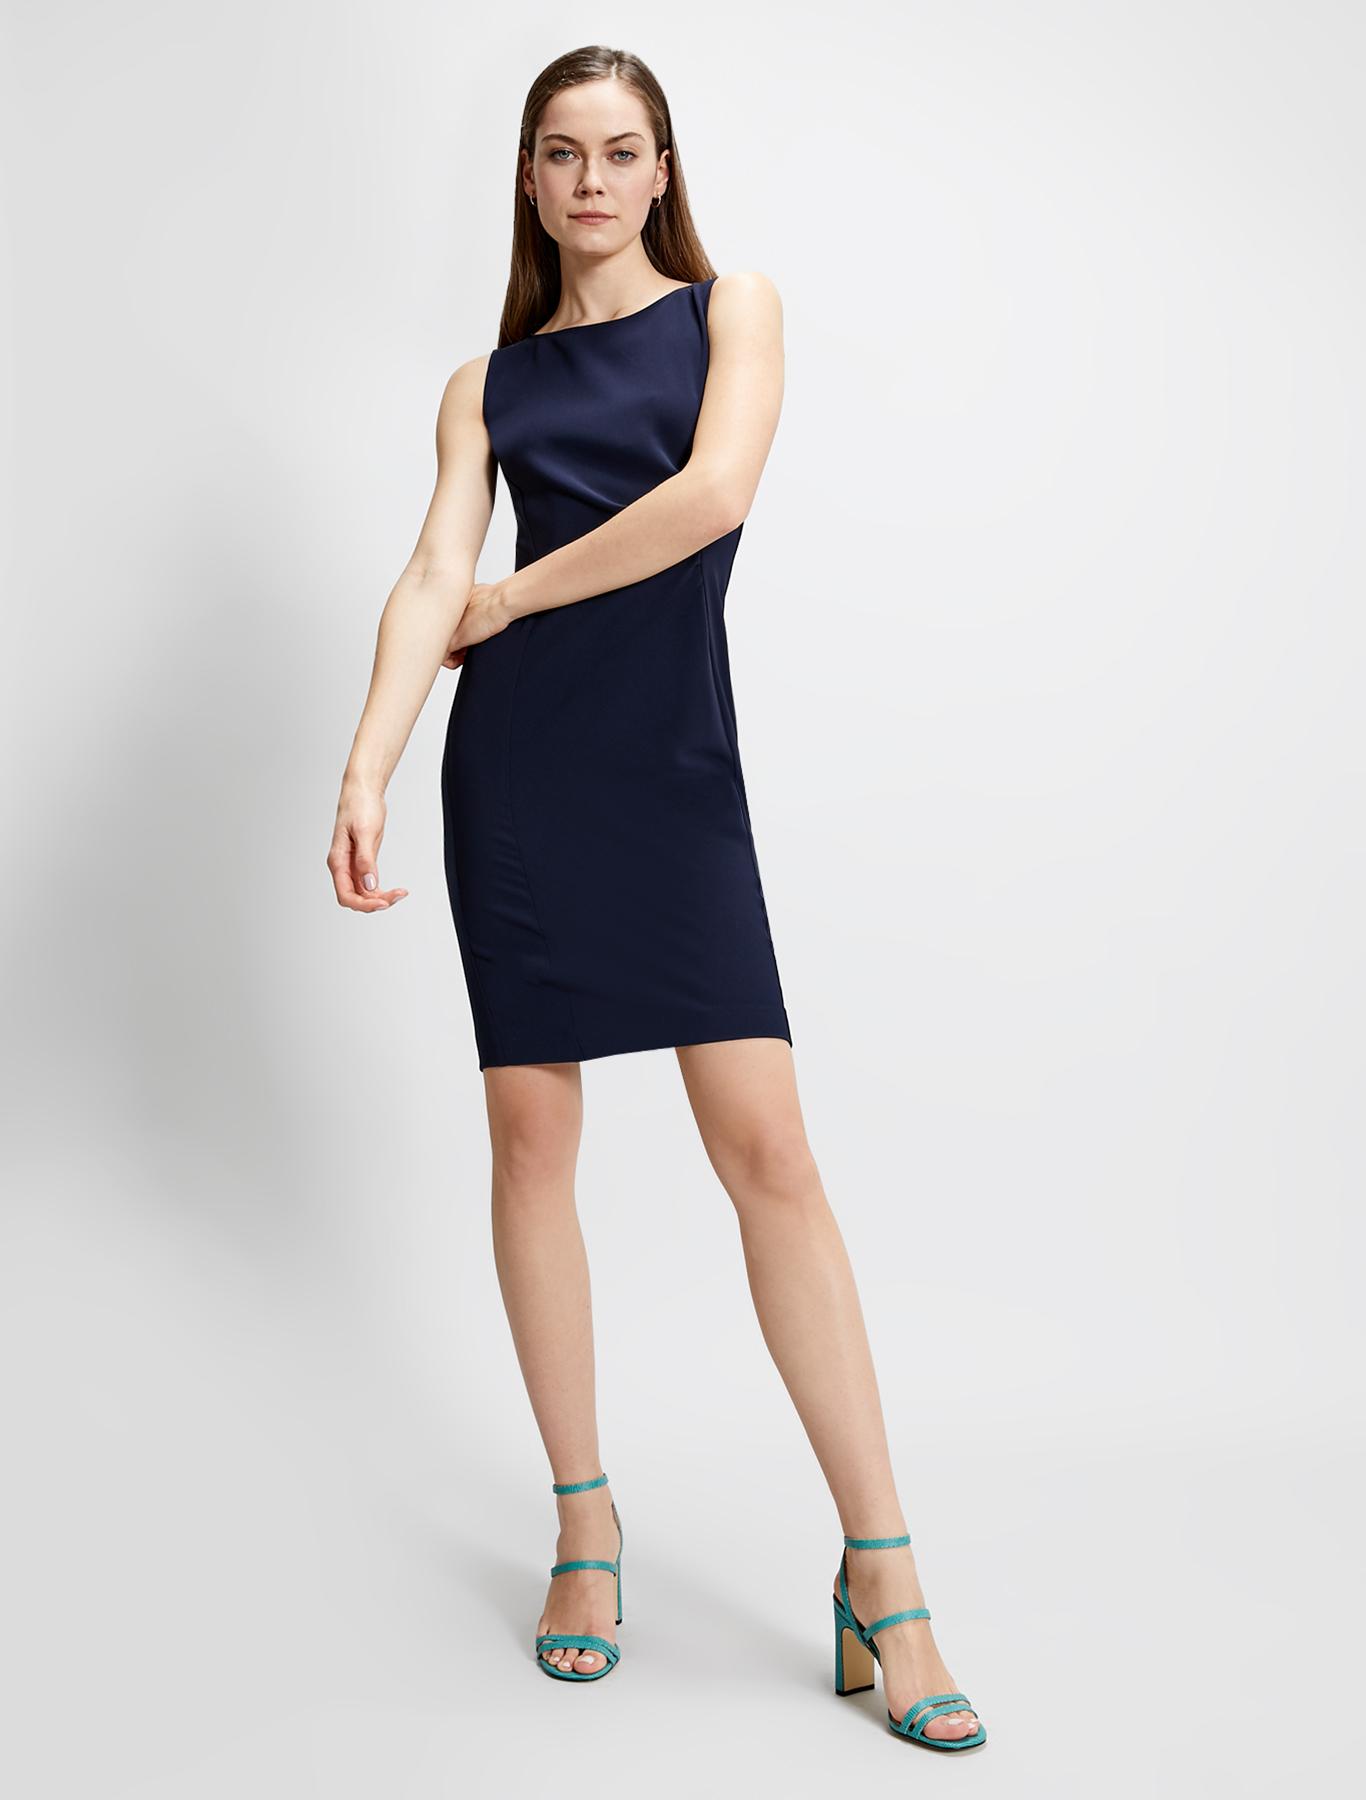 Slim sheath dress with draping - navy blue - pennyblack